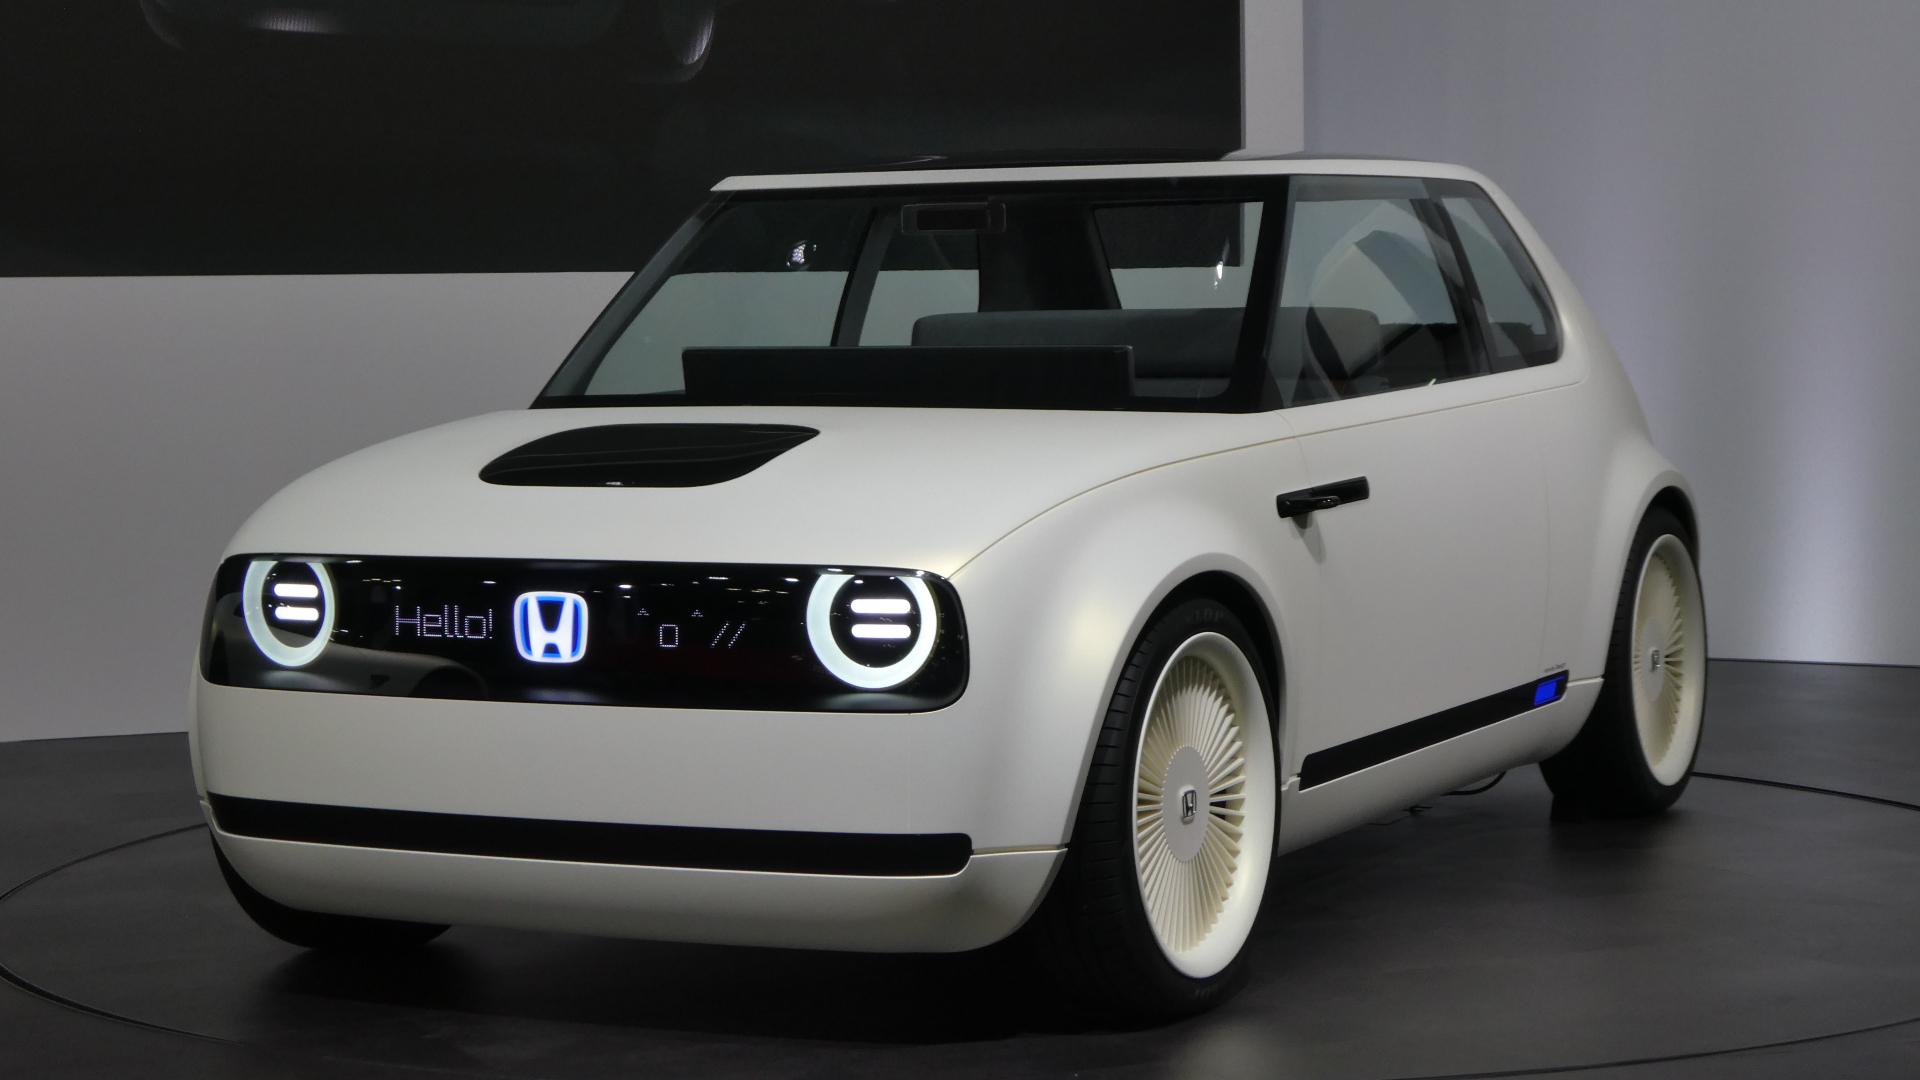 File:Honda S660 βSpecial edition -komorebi edition,.png - Wikimedia ...